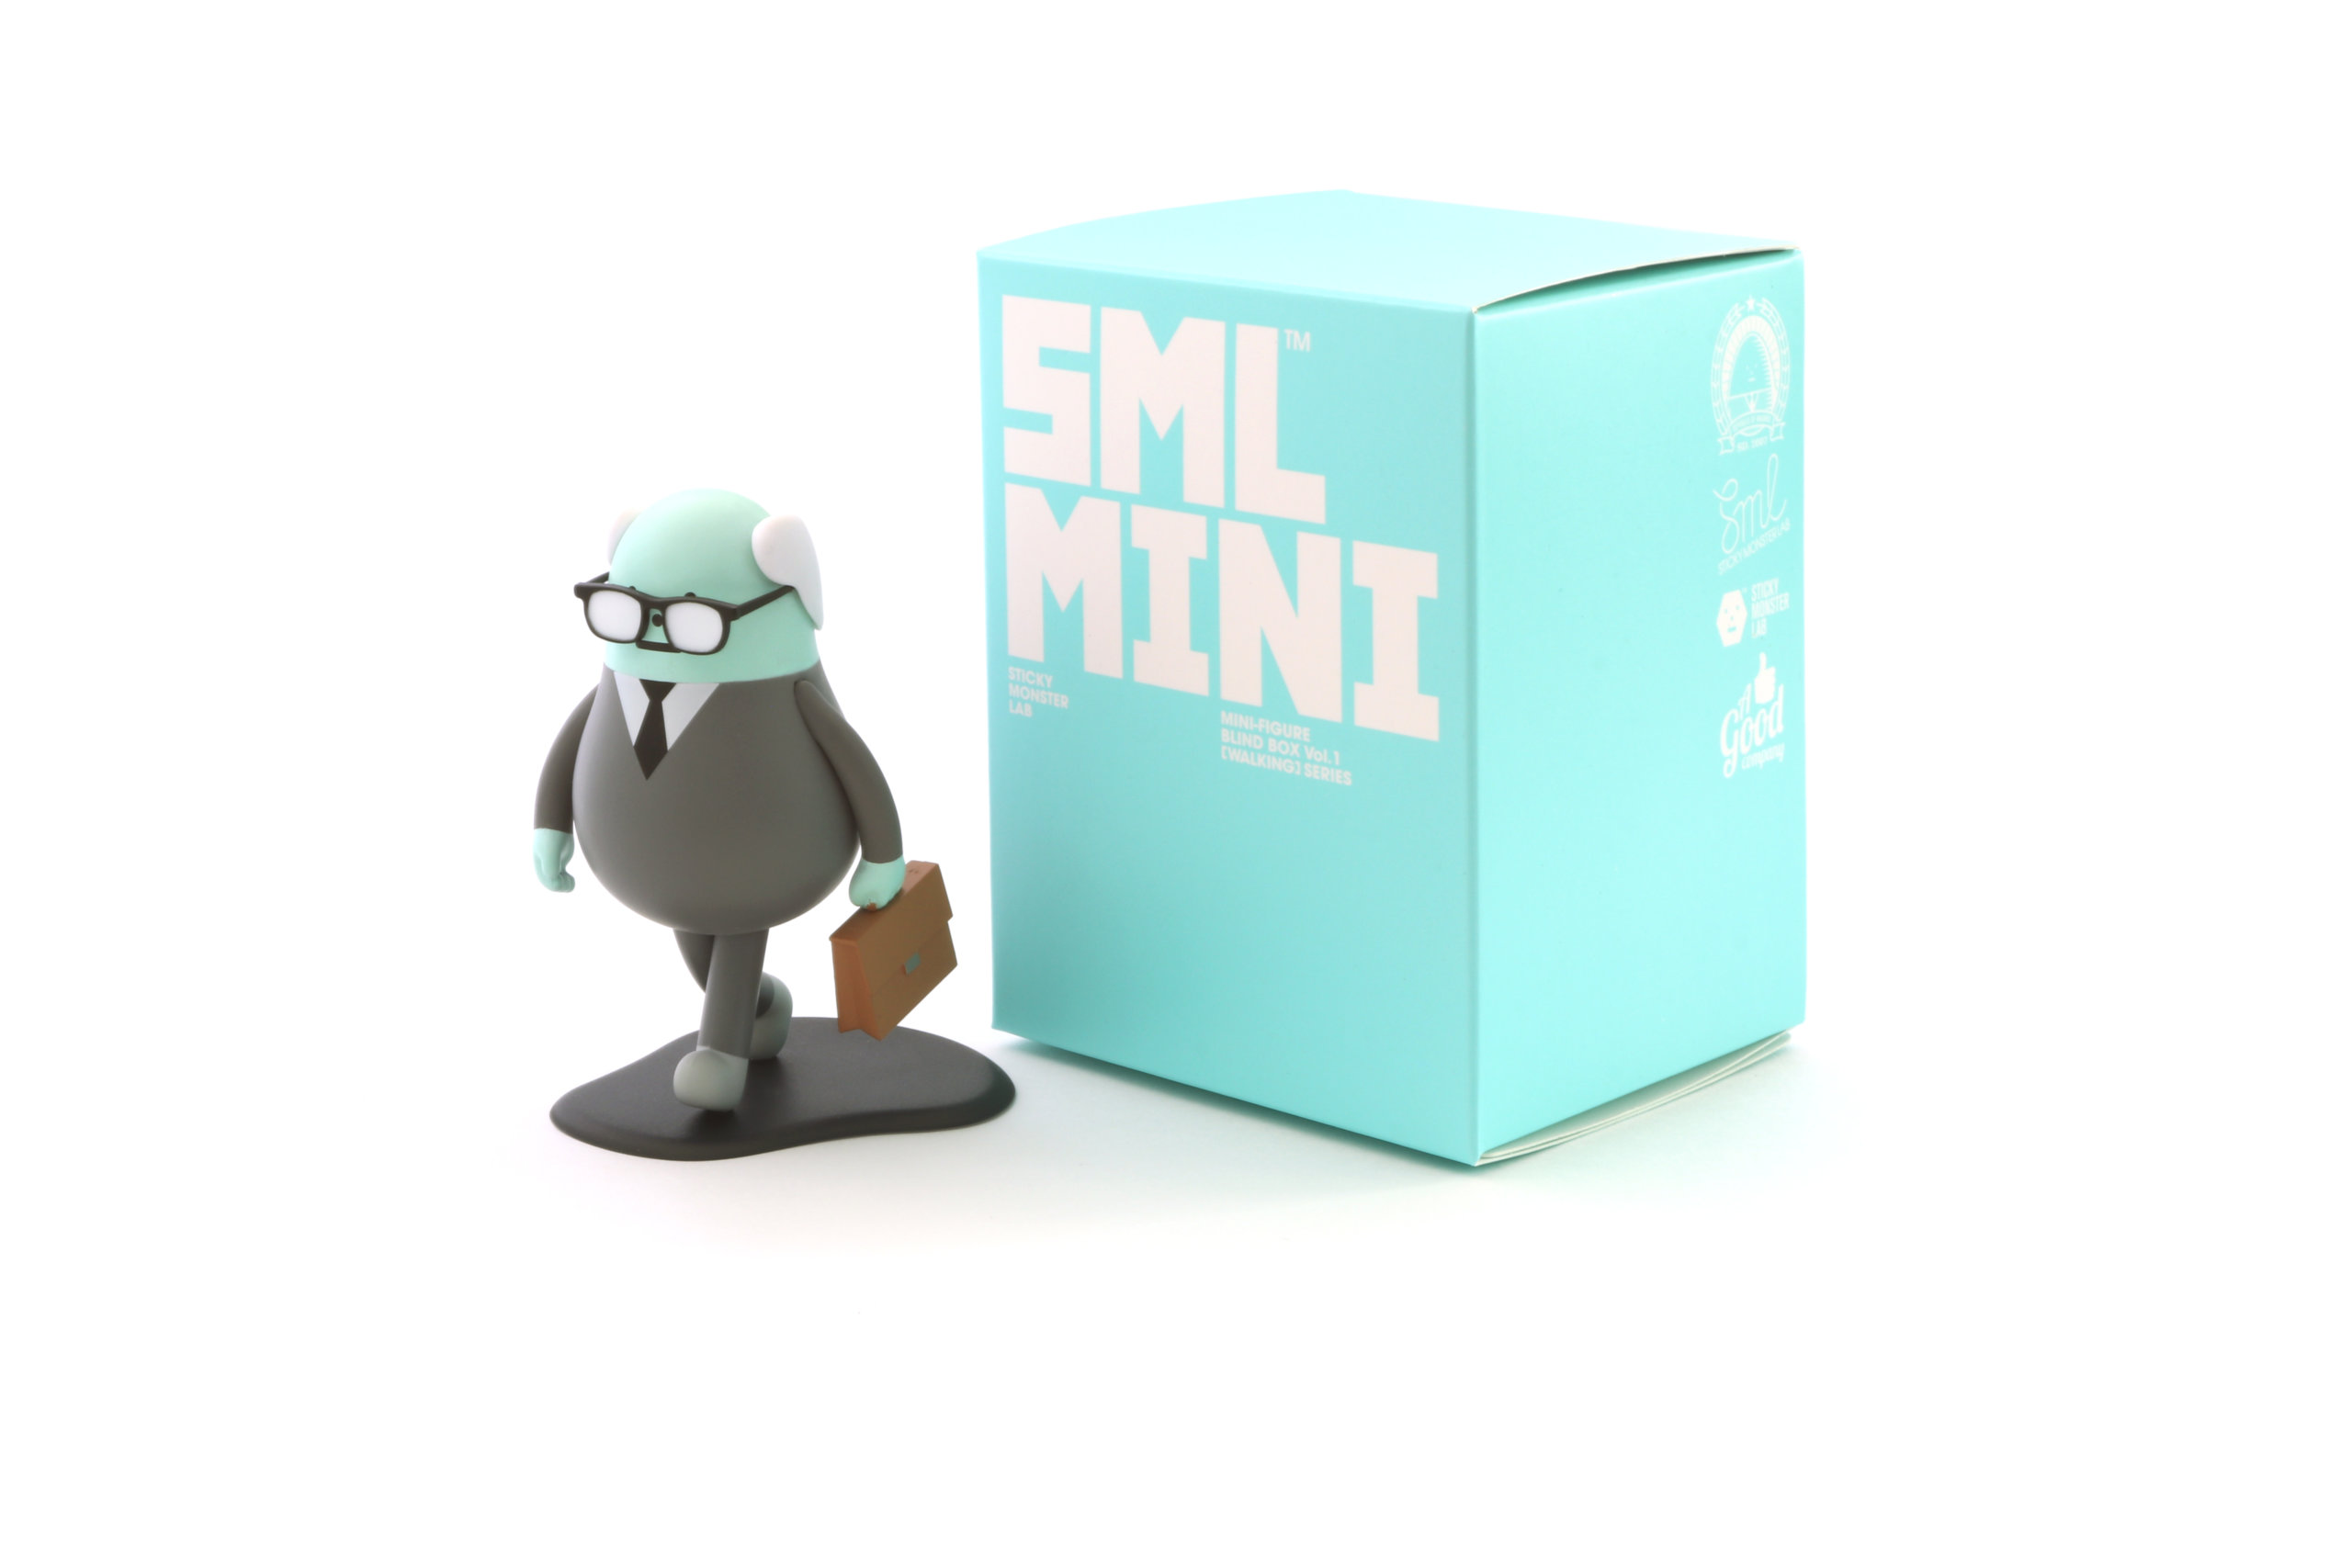 Fathermon為步步系列的隱藏版公仔!平均30盒只有1盒是它!